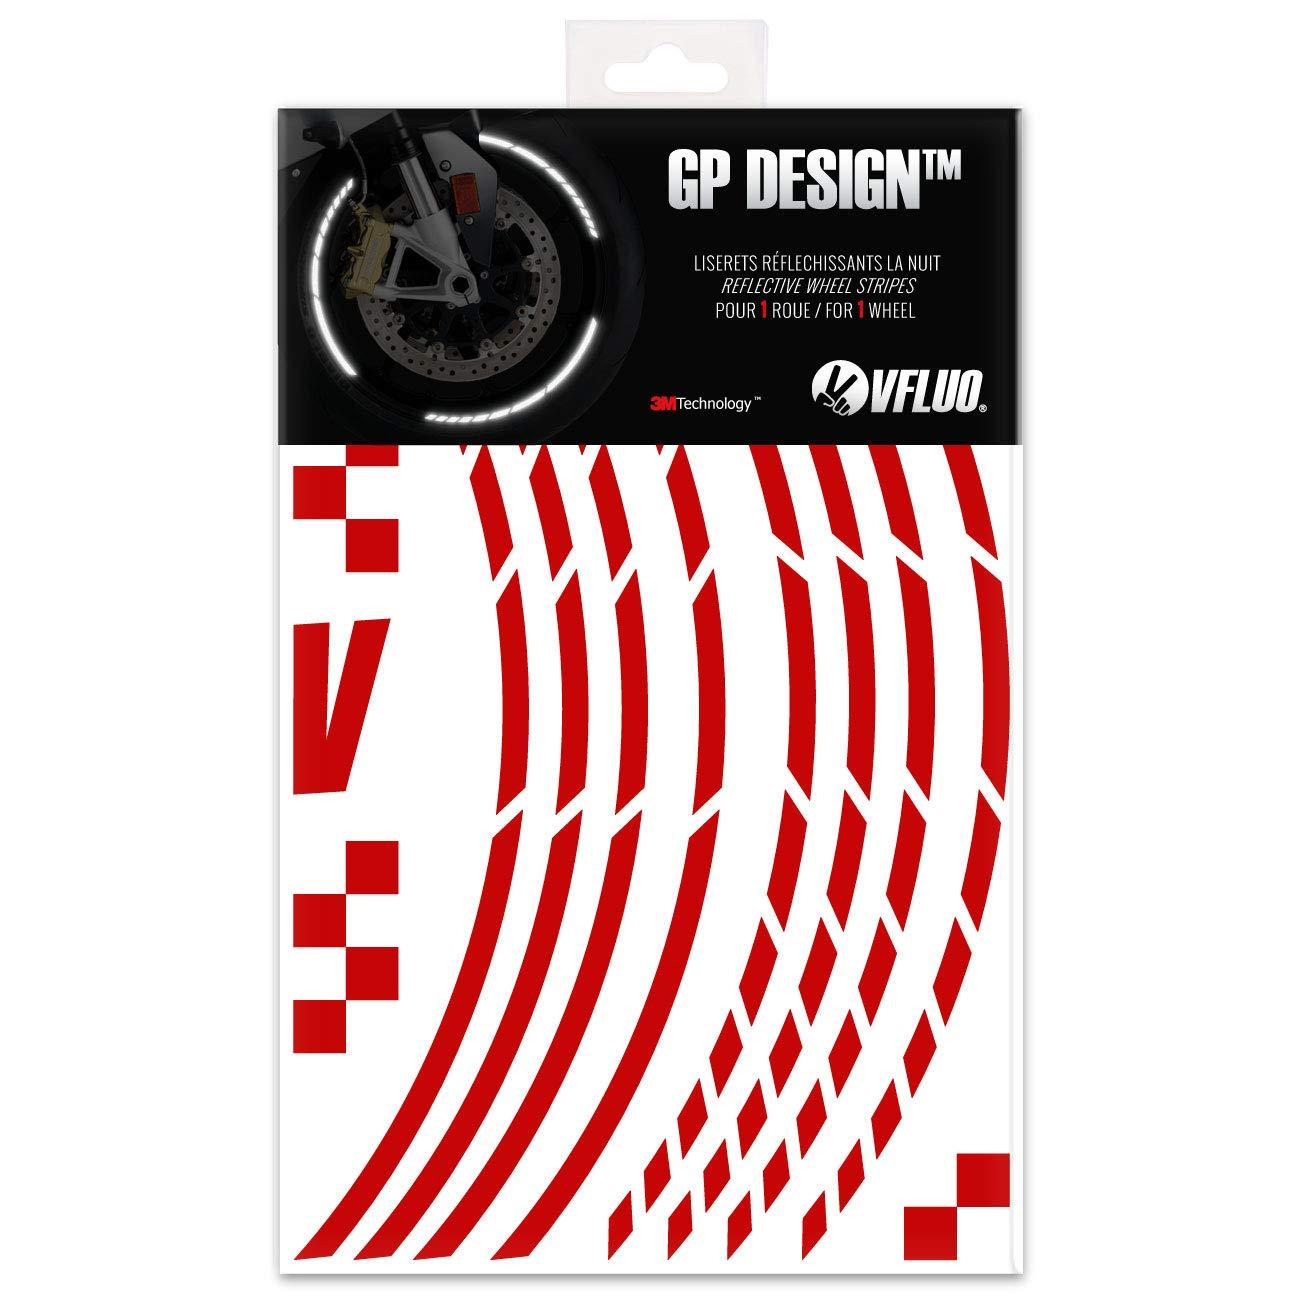 1 Rueda Kit de Cintas Rosa VFLUO GP Design/™ Anchura XL : 7 mm Rayas Retro Reflectantes para Llantas de Moto 3M Technology/™